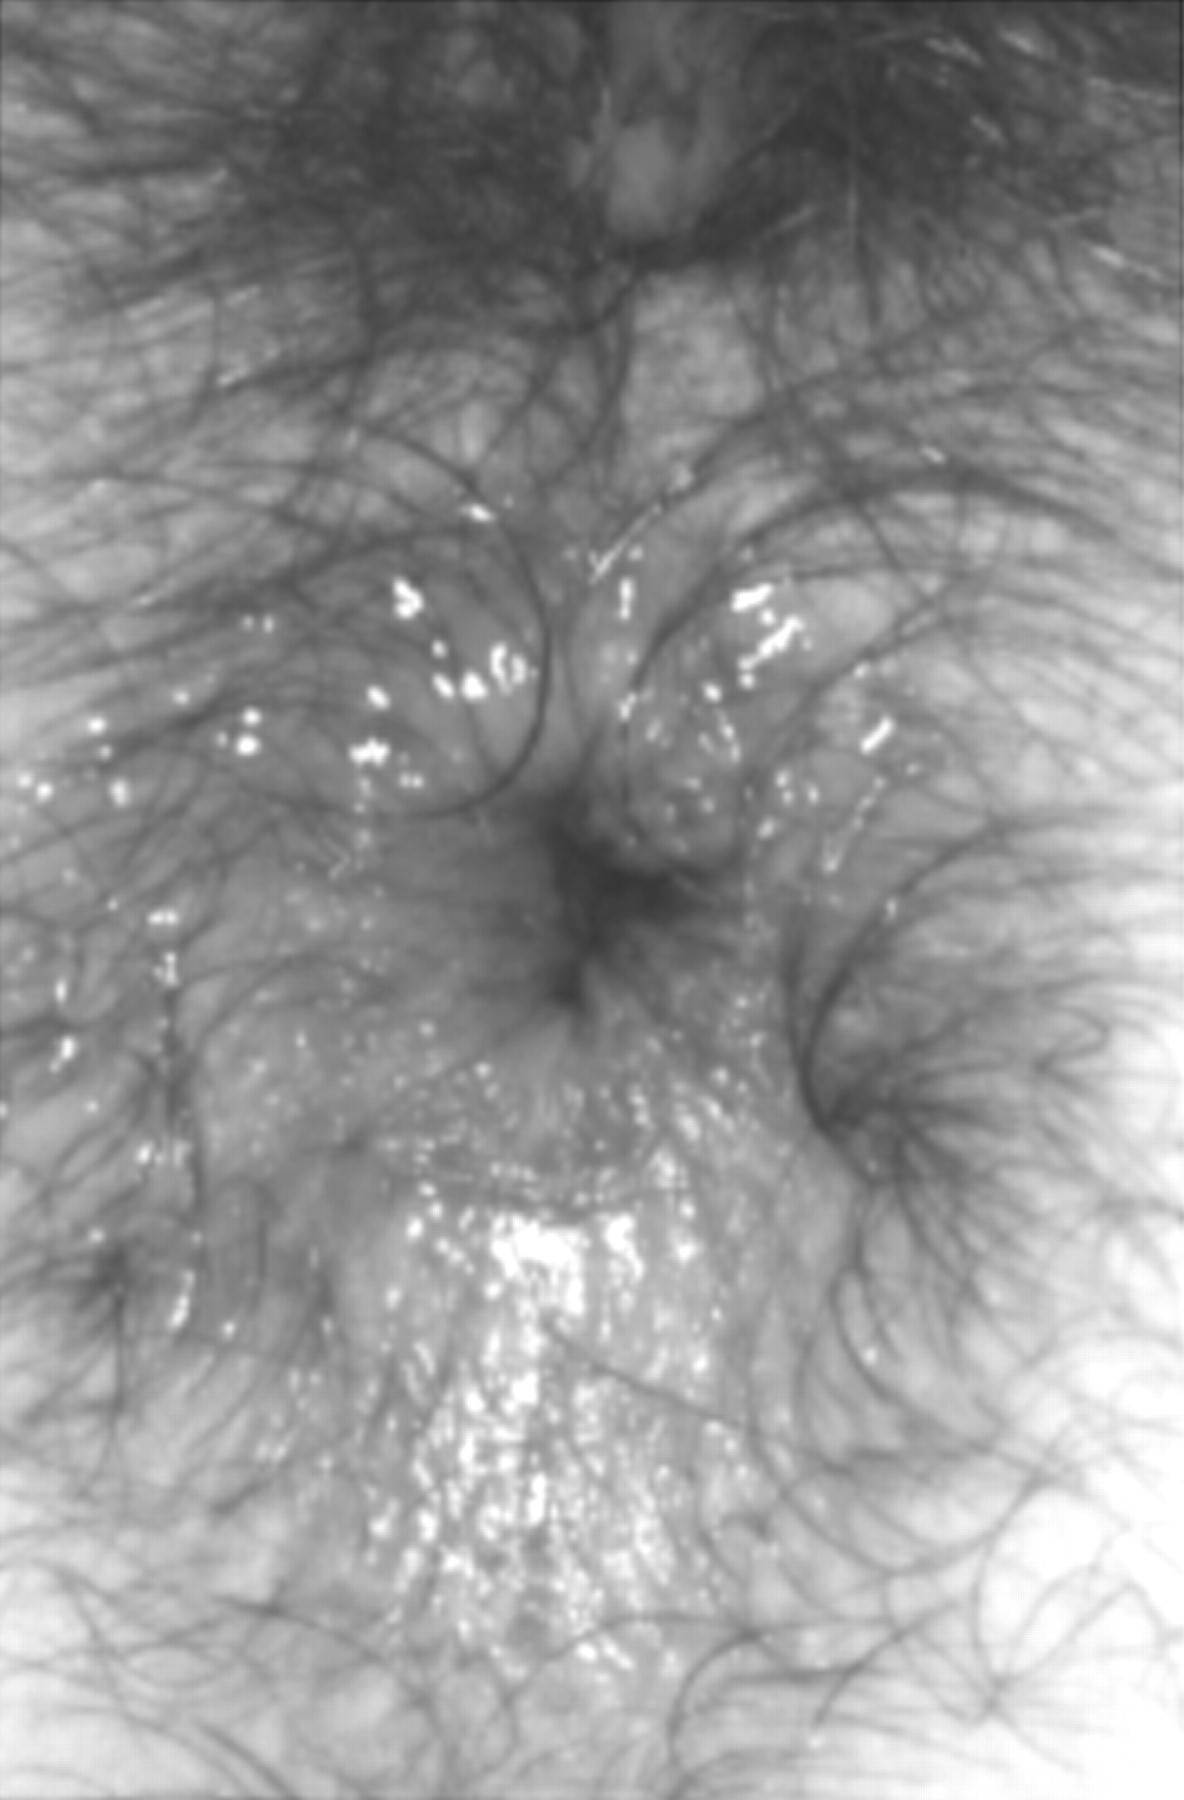 absent anal wink bulbocavenosis reflexes